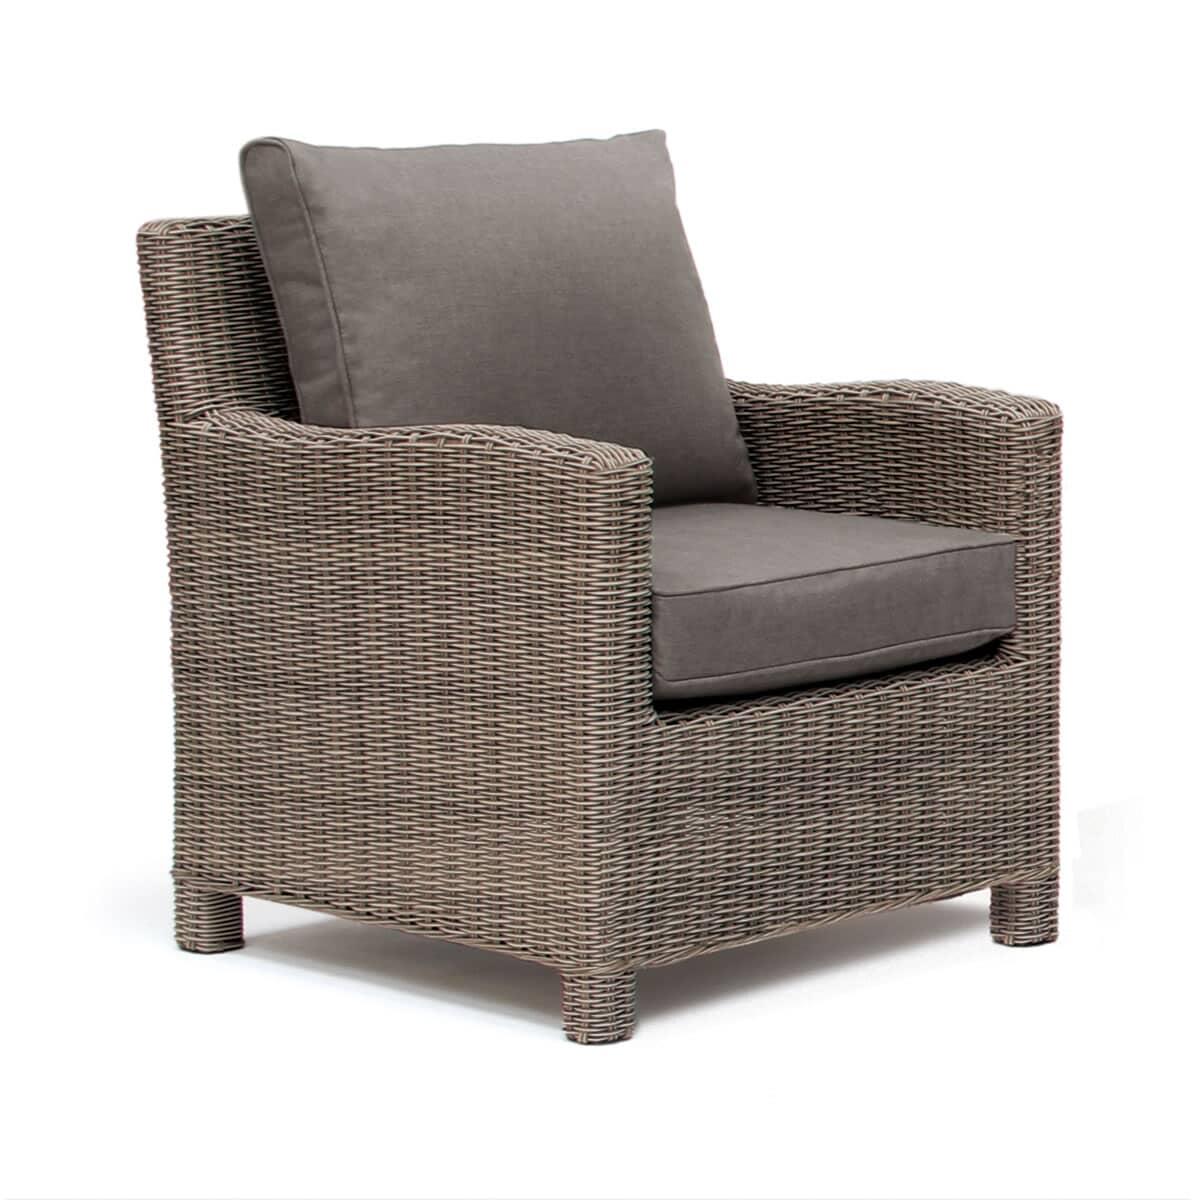 Kettler palma armchair rattan 0193312 2100 garden for Furniture world